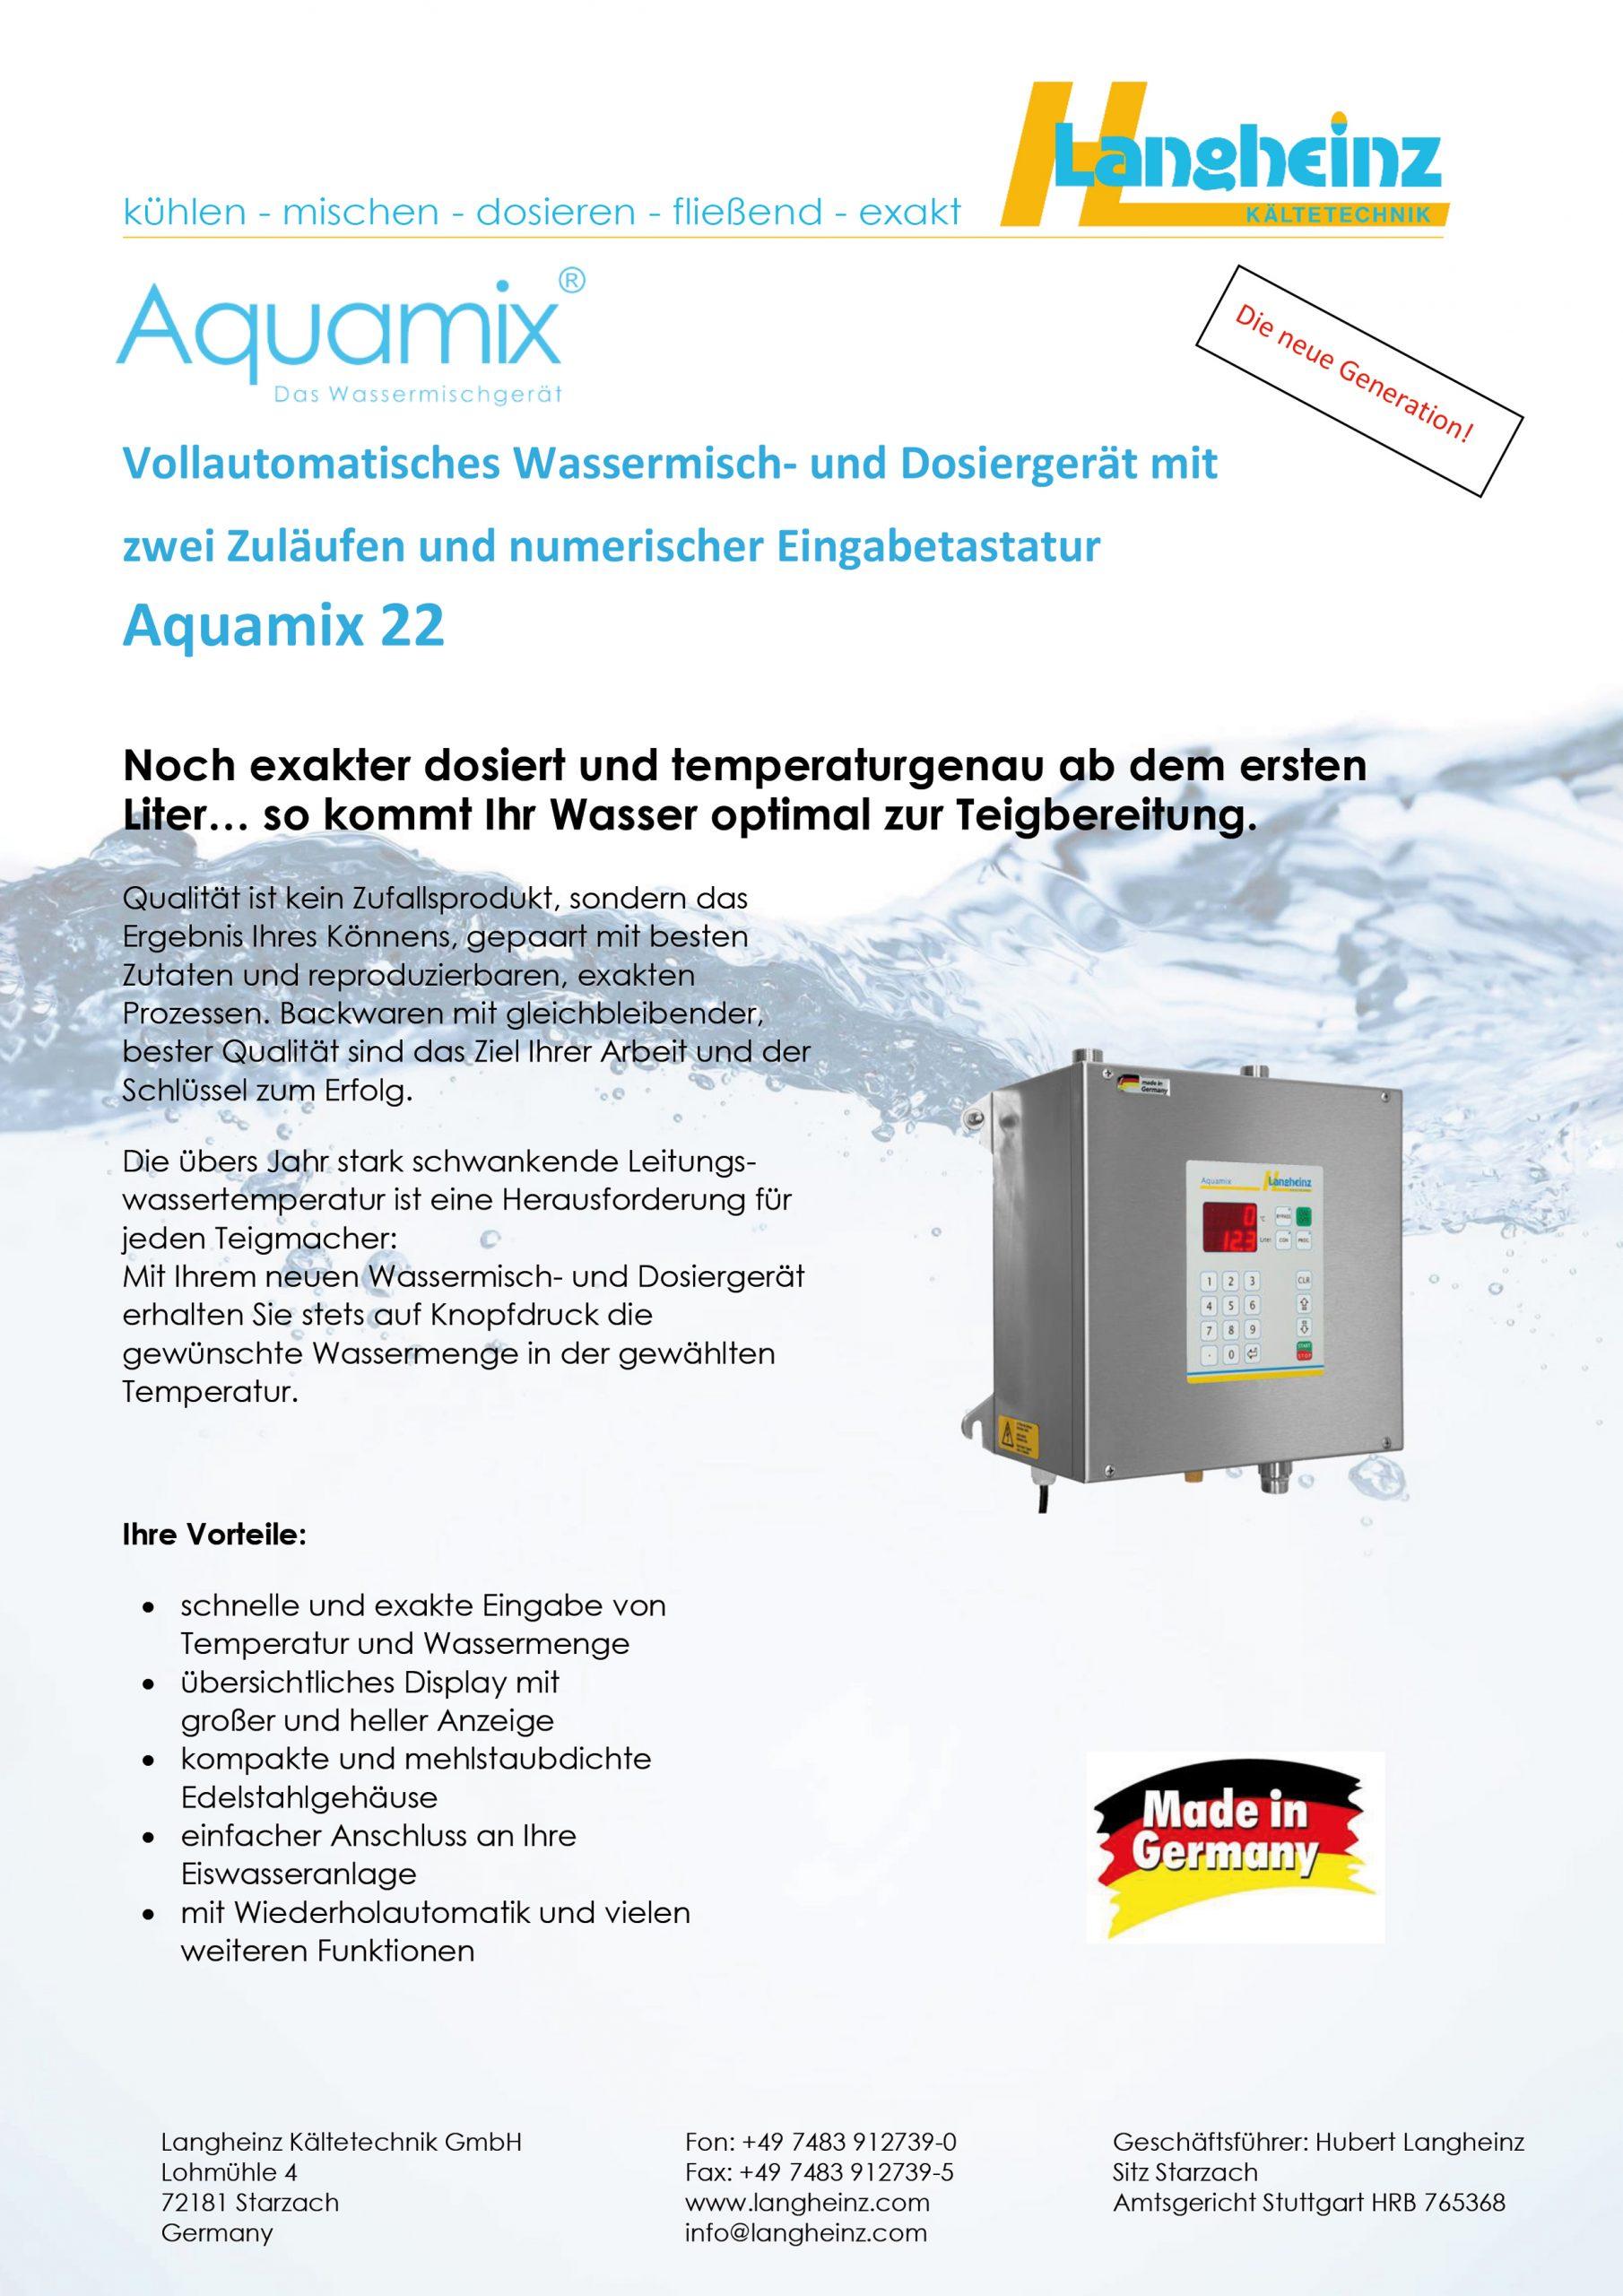 Datenblatt Aquamix 22 (Preview)